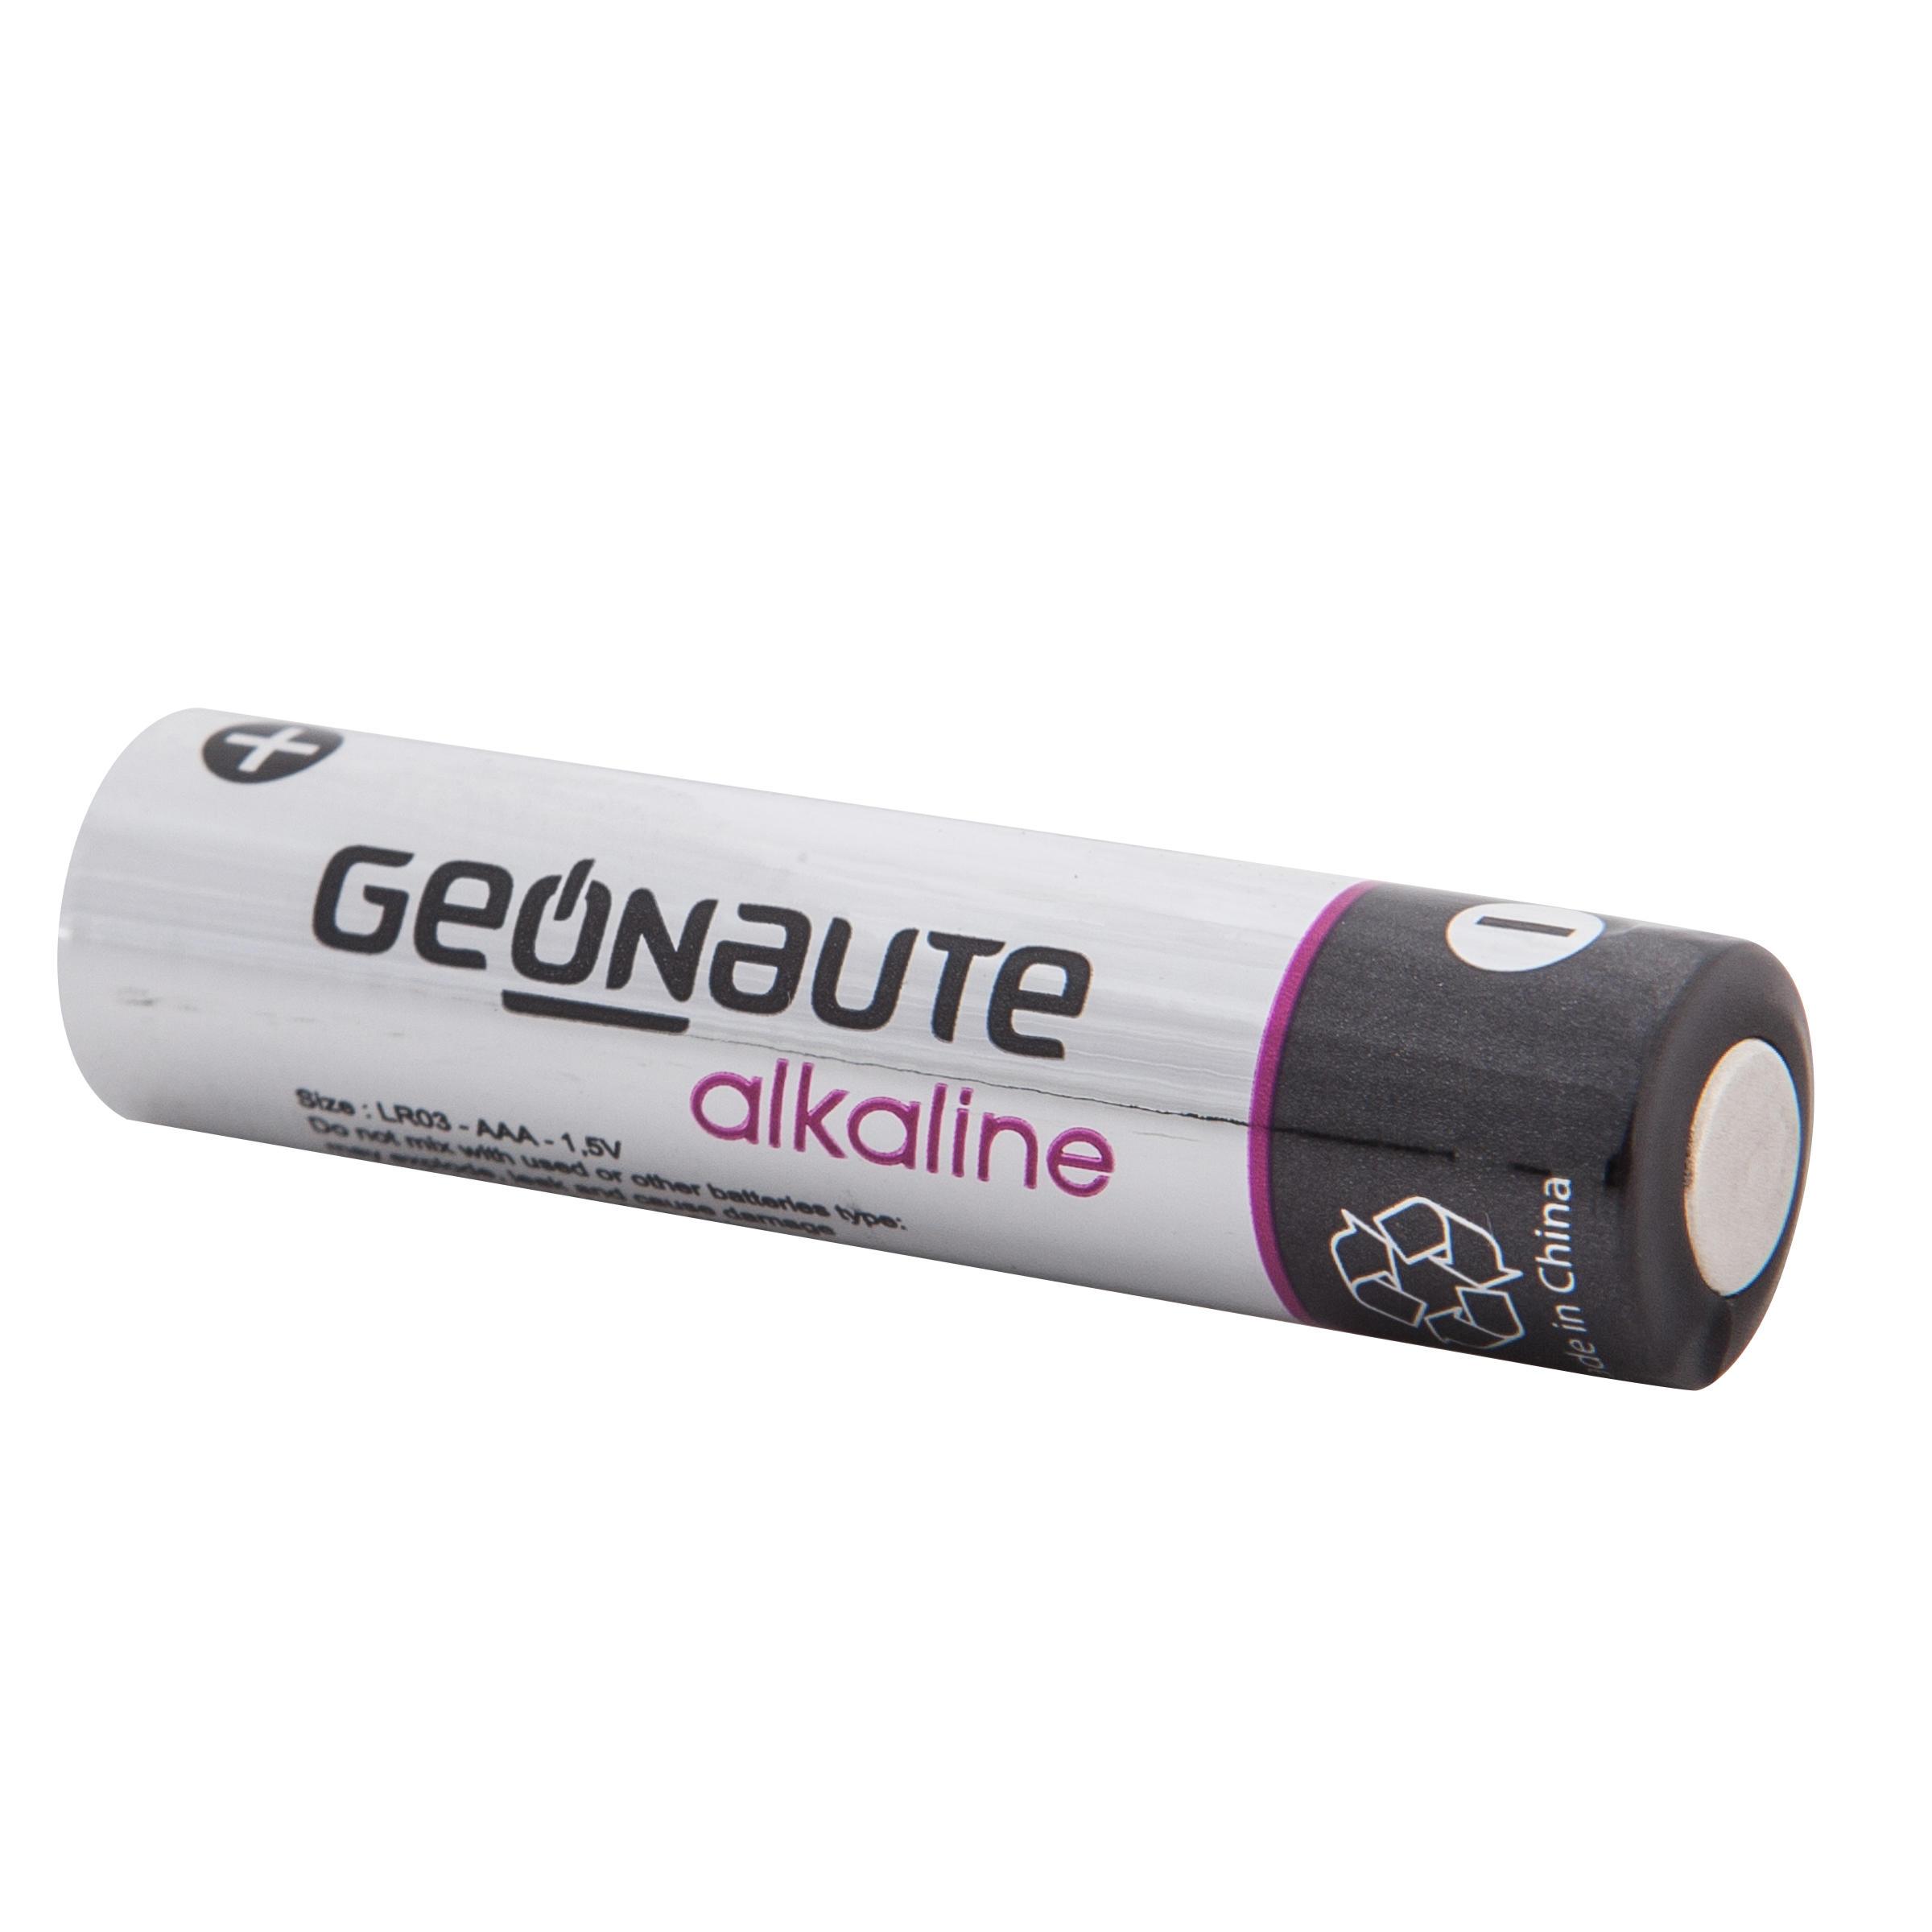 Pack of 4 LR03-AAA 1.5V batteries